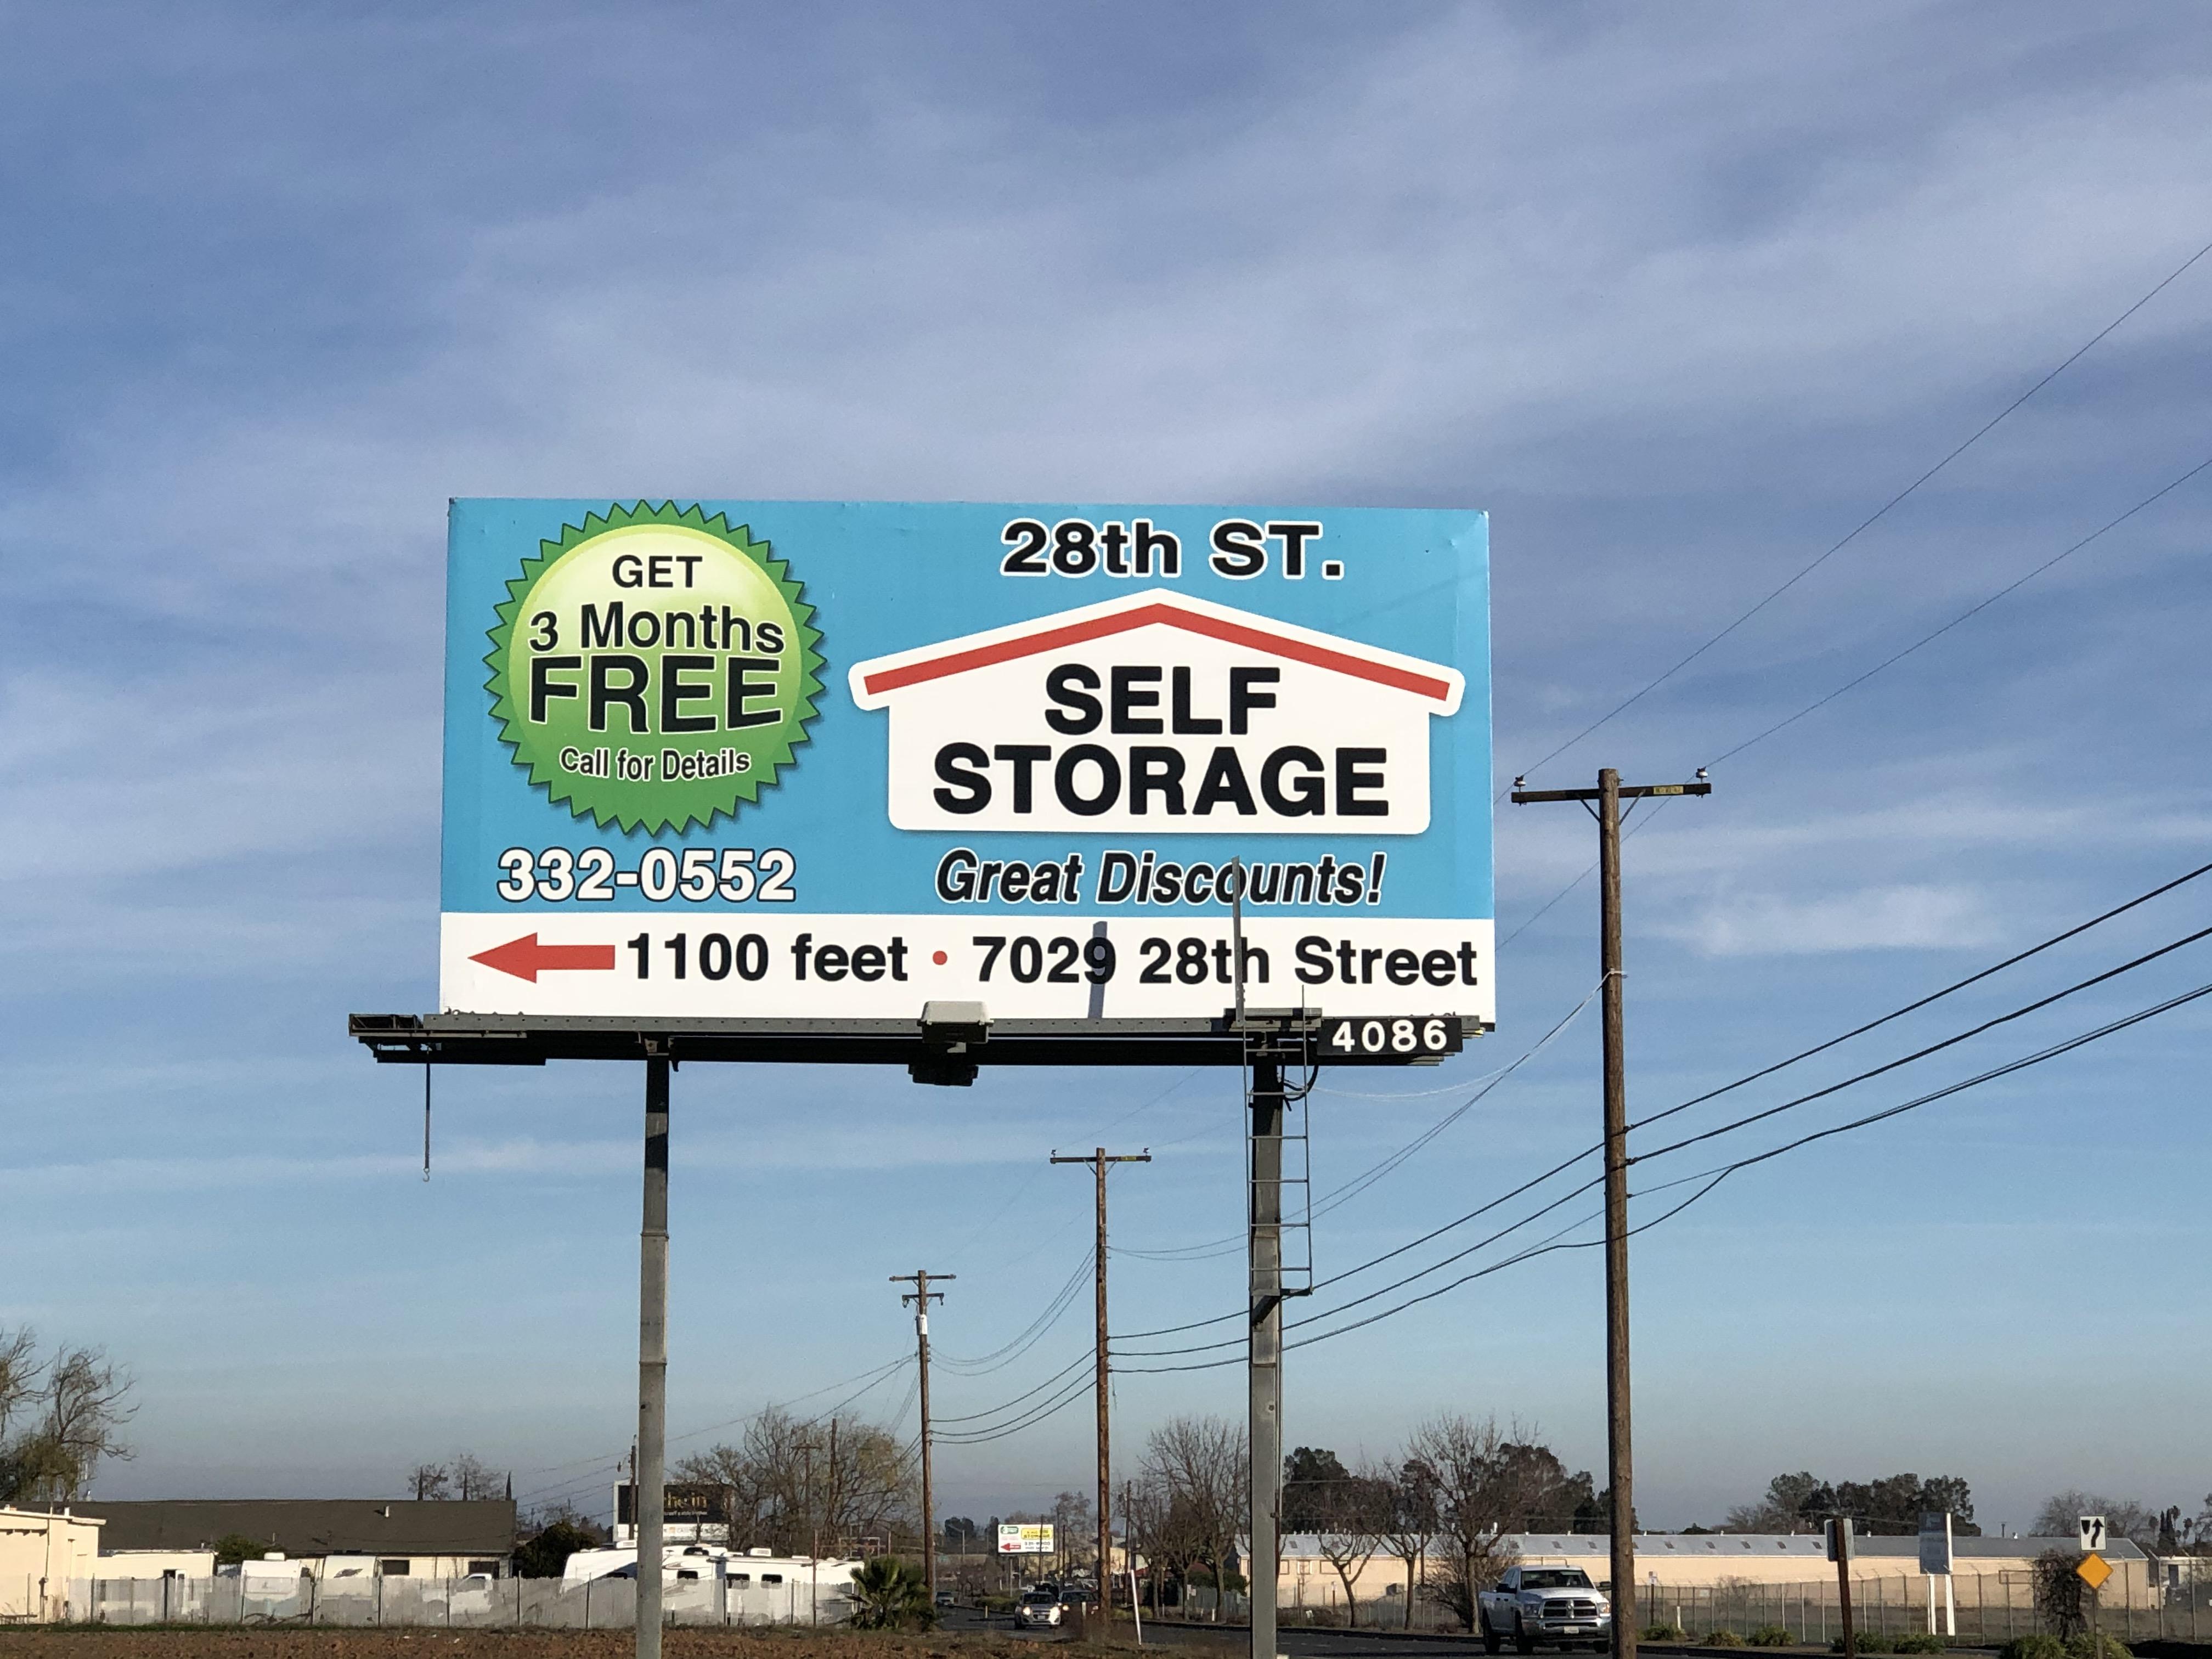 28th St. Self Storage